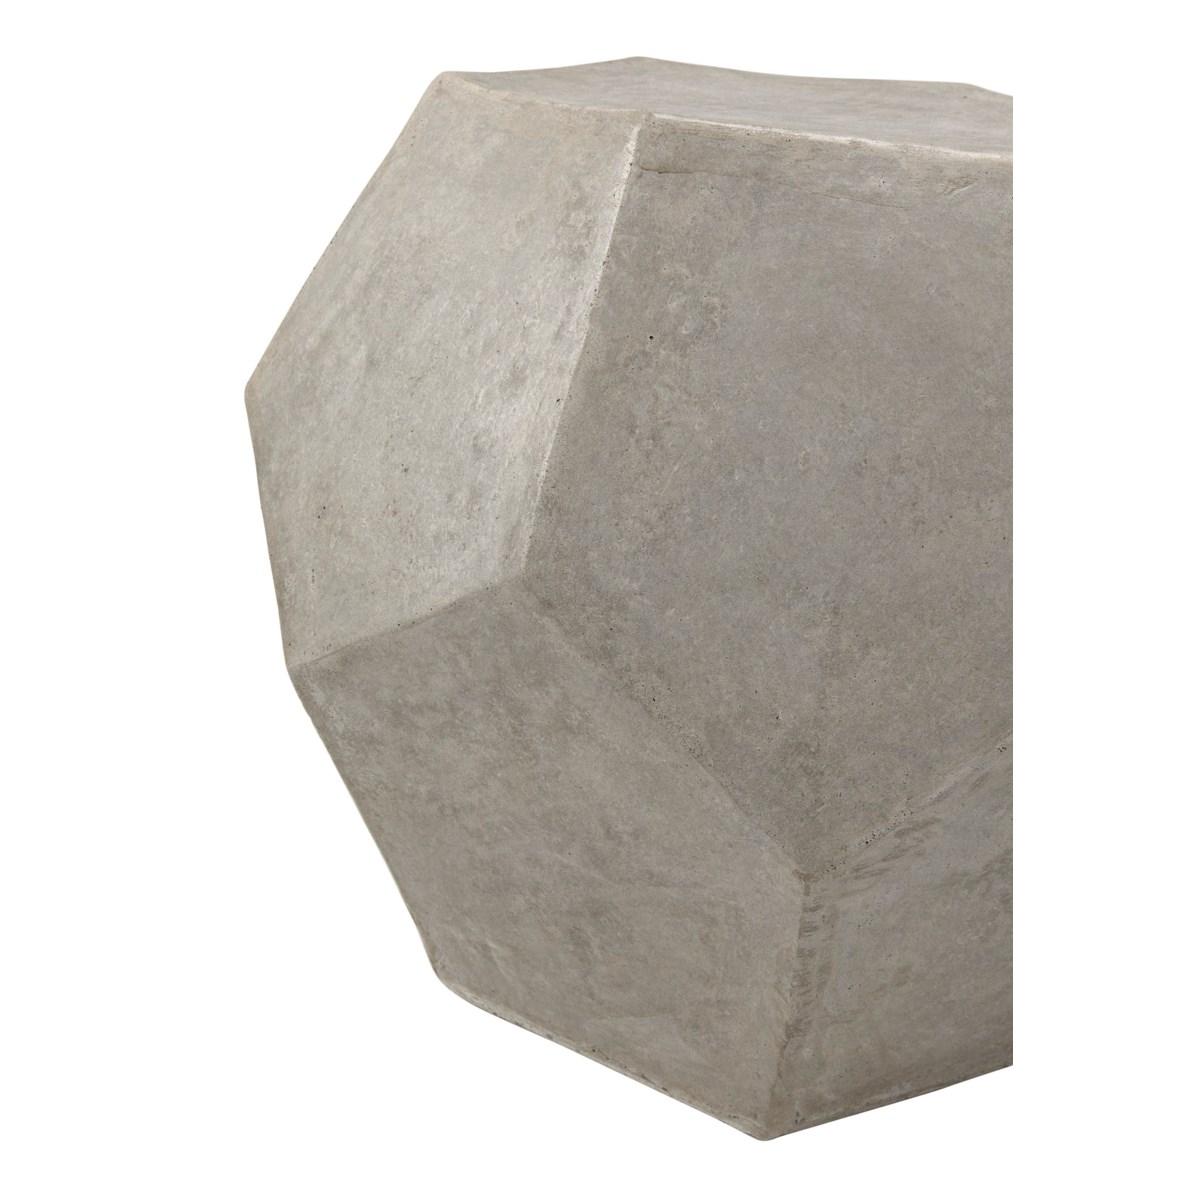 Geometry Side Table/Stool, Fiber Cement